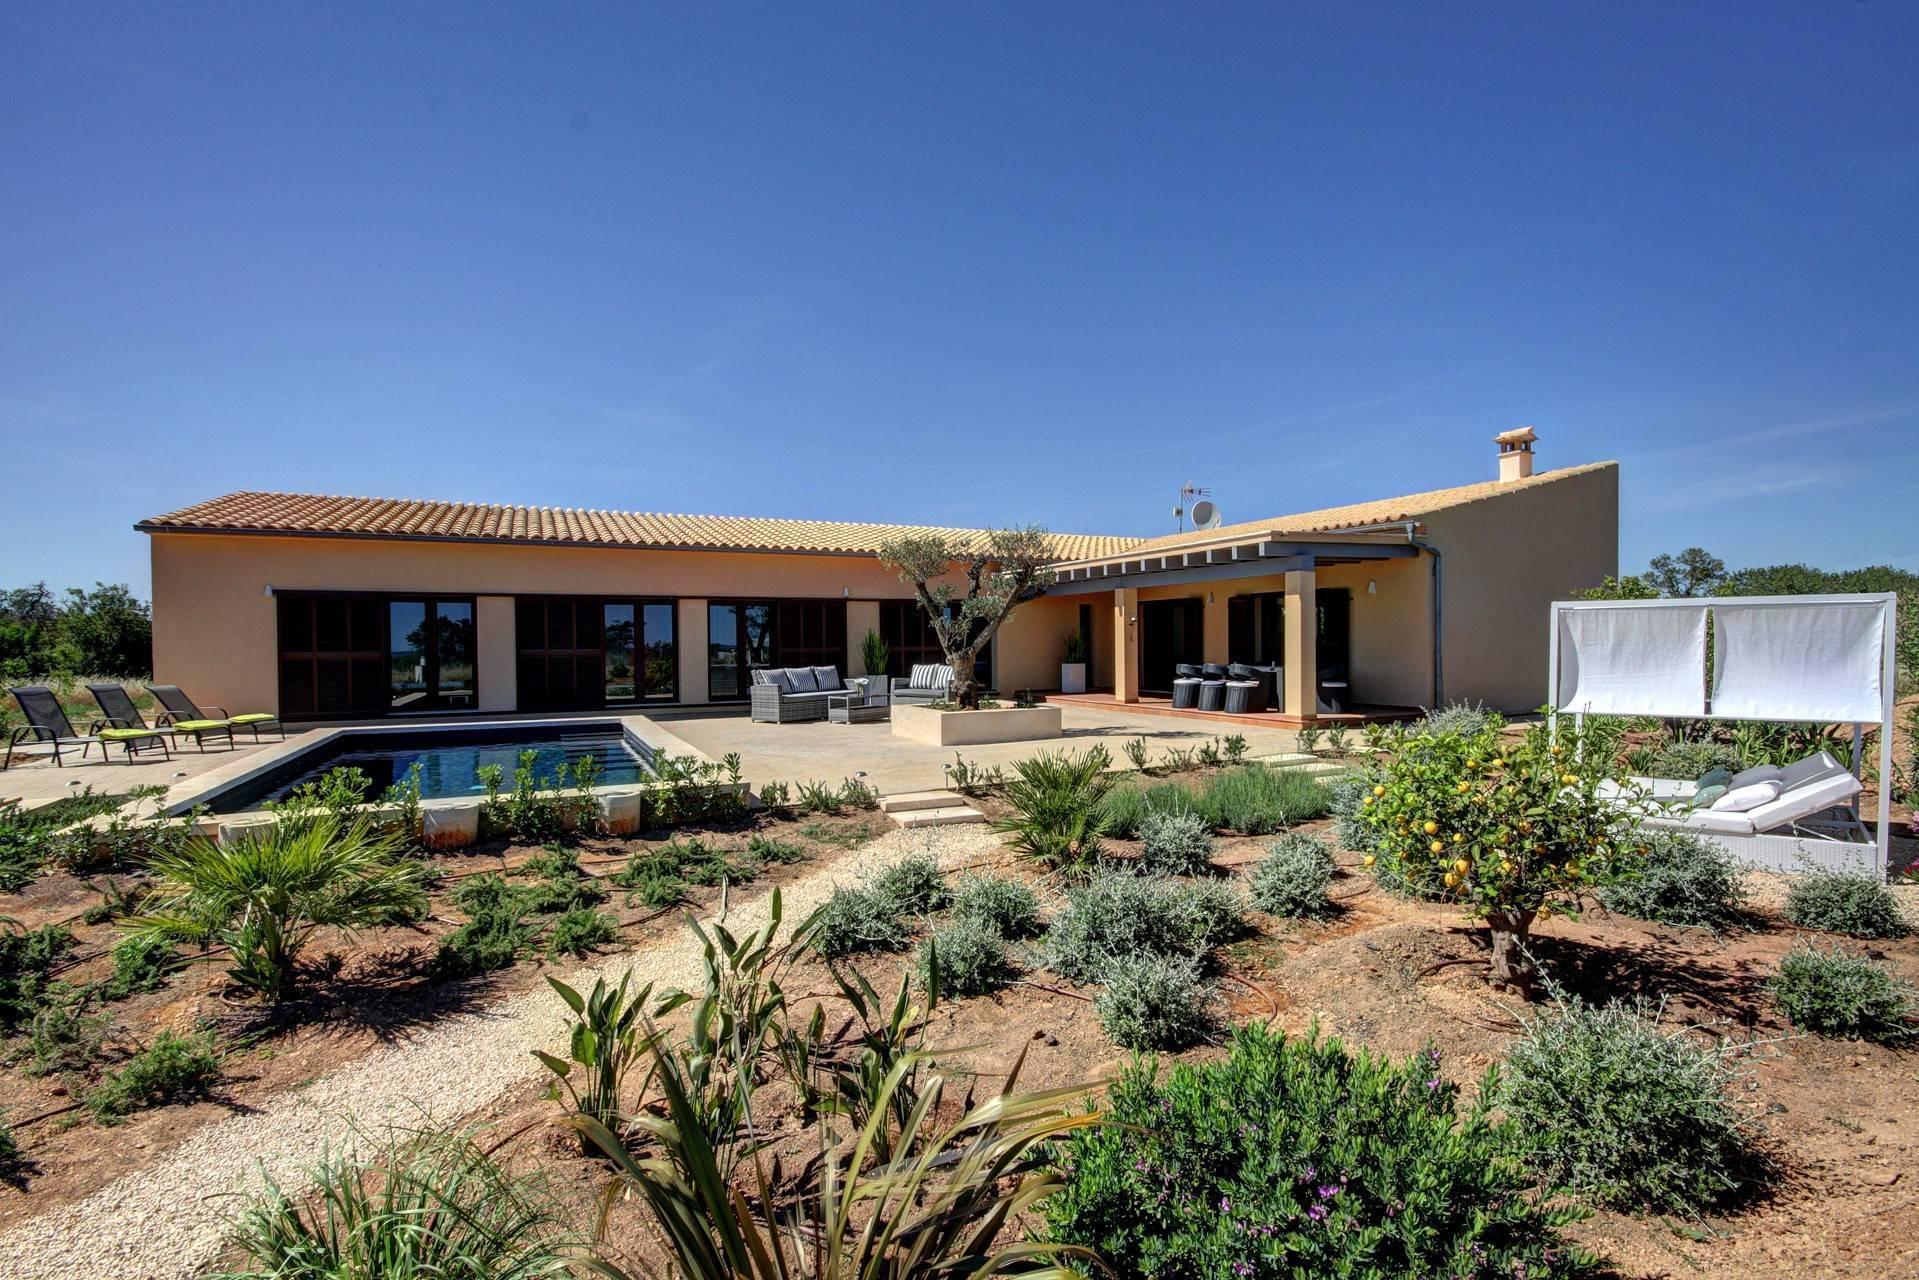 01-262 Modern Finca Mallorca south Bild 1